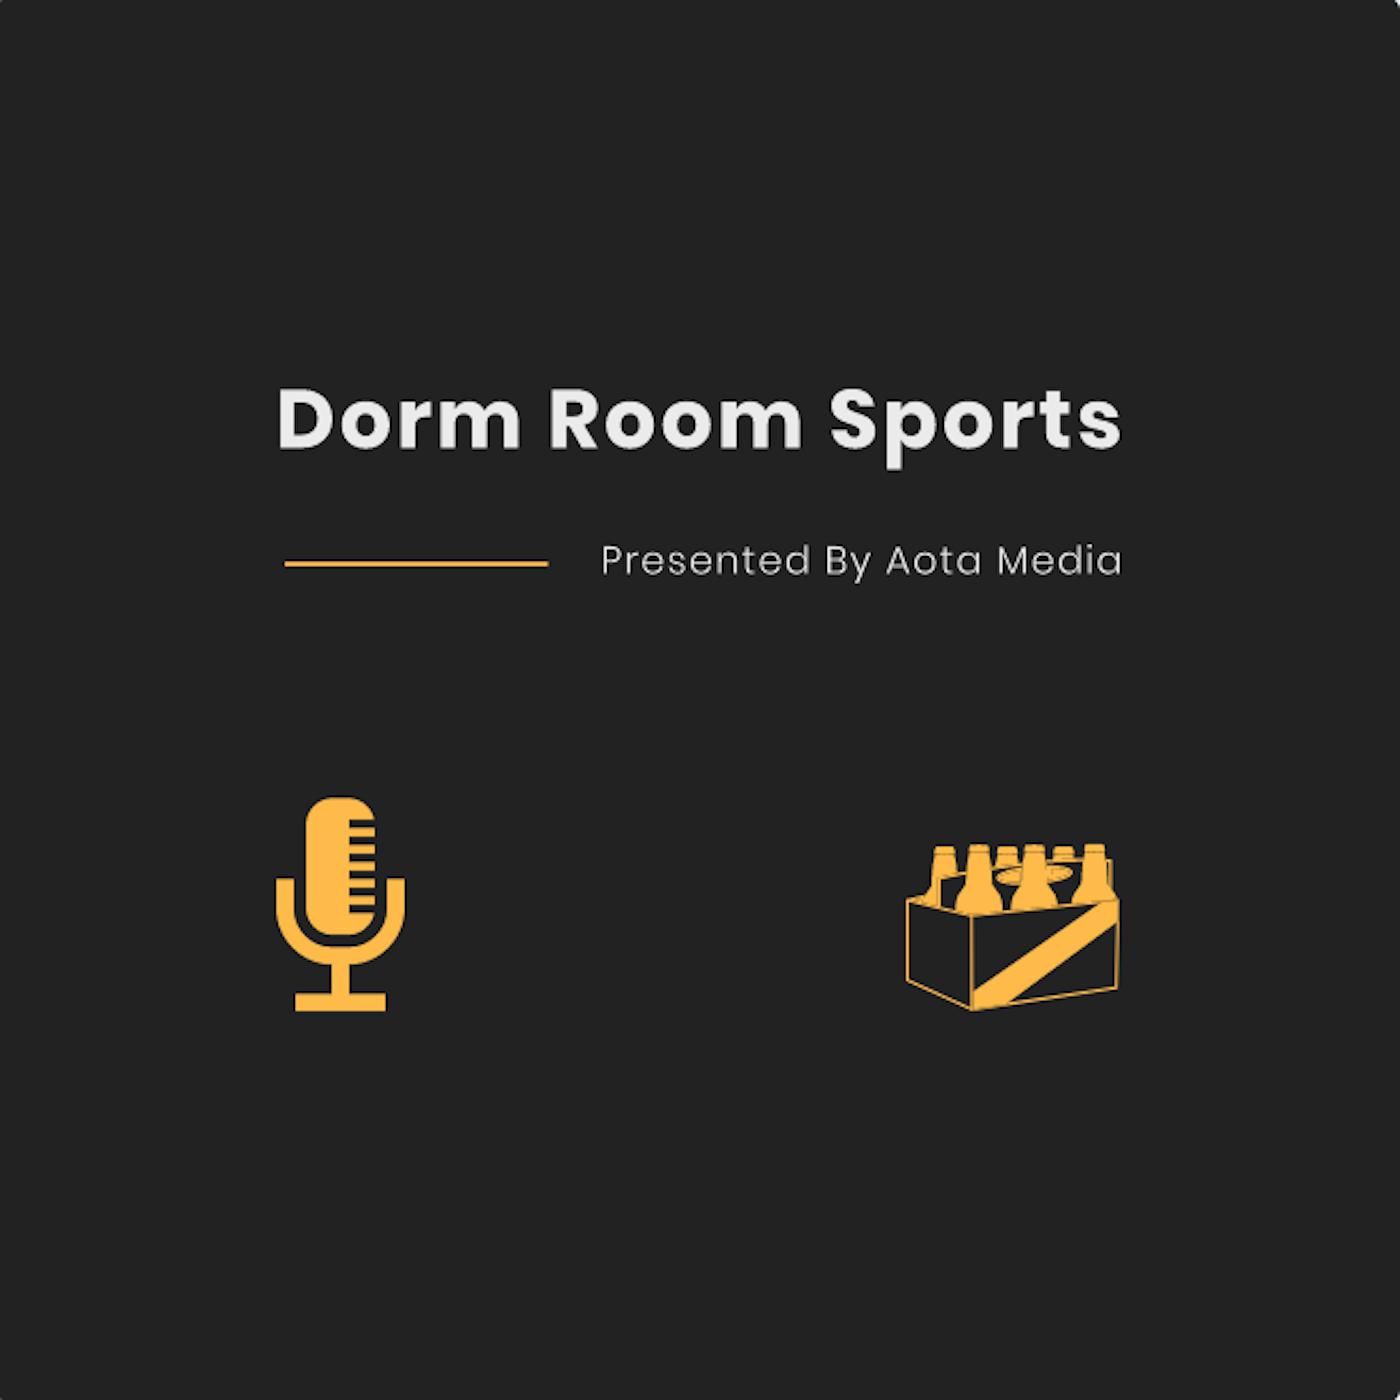 Dorm Room Sports